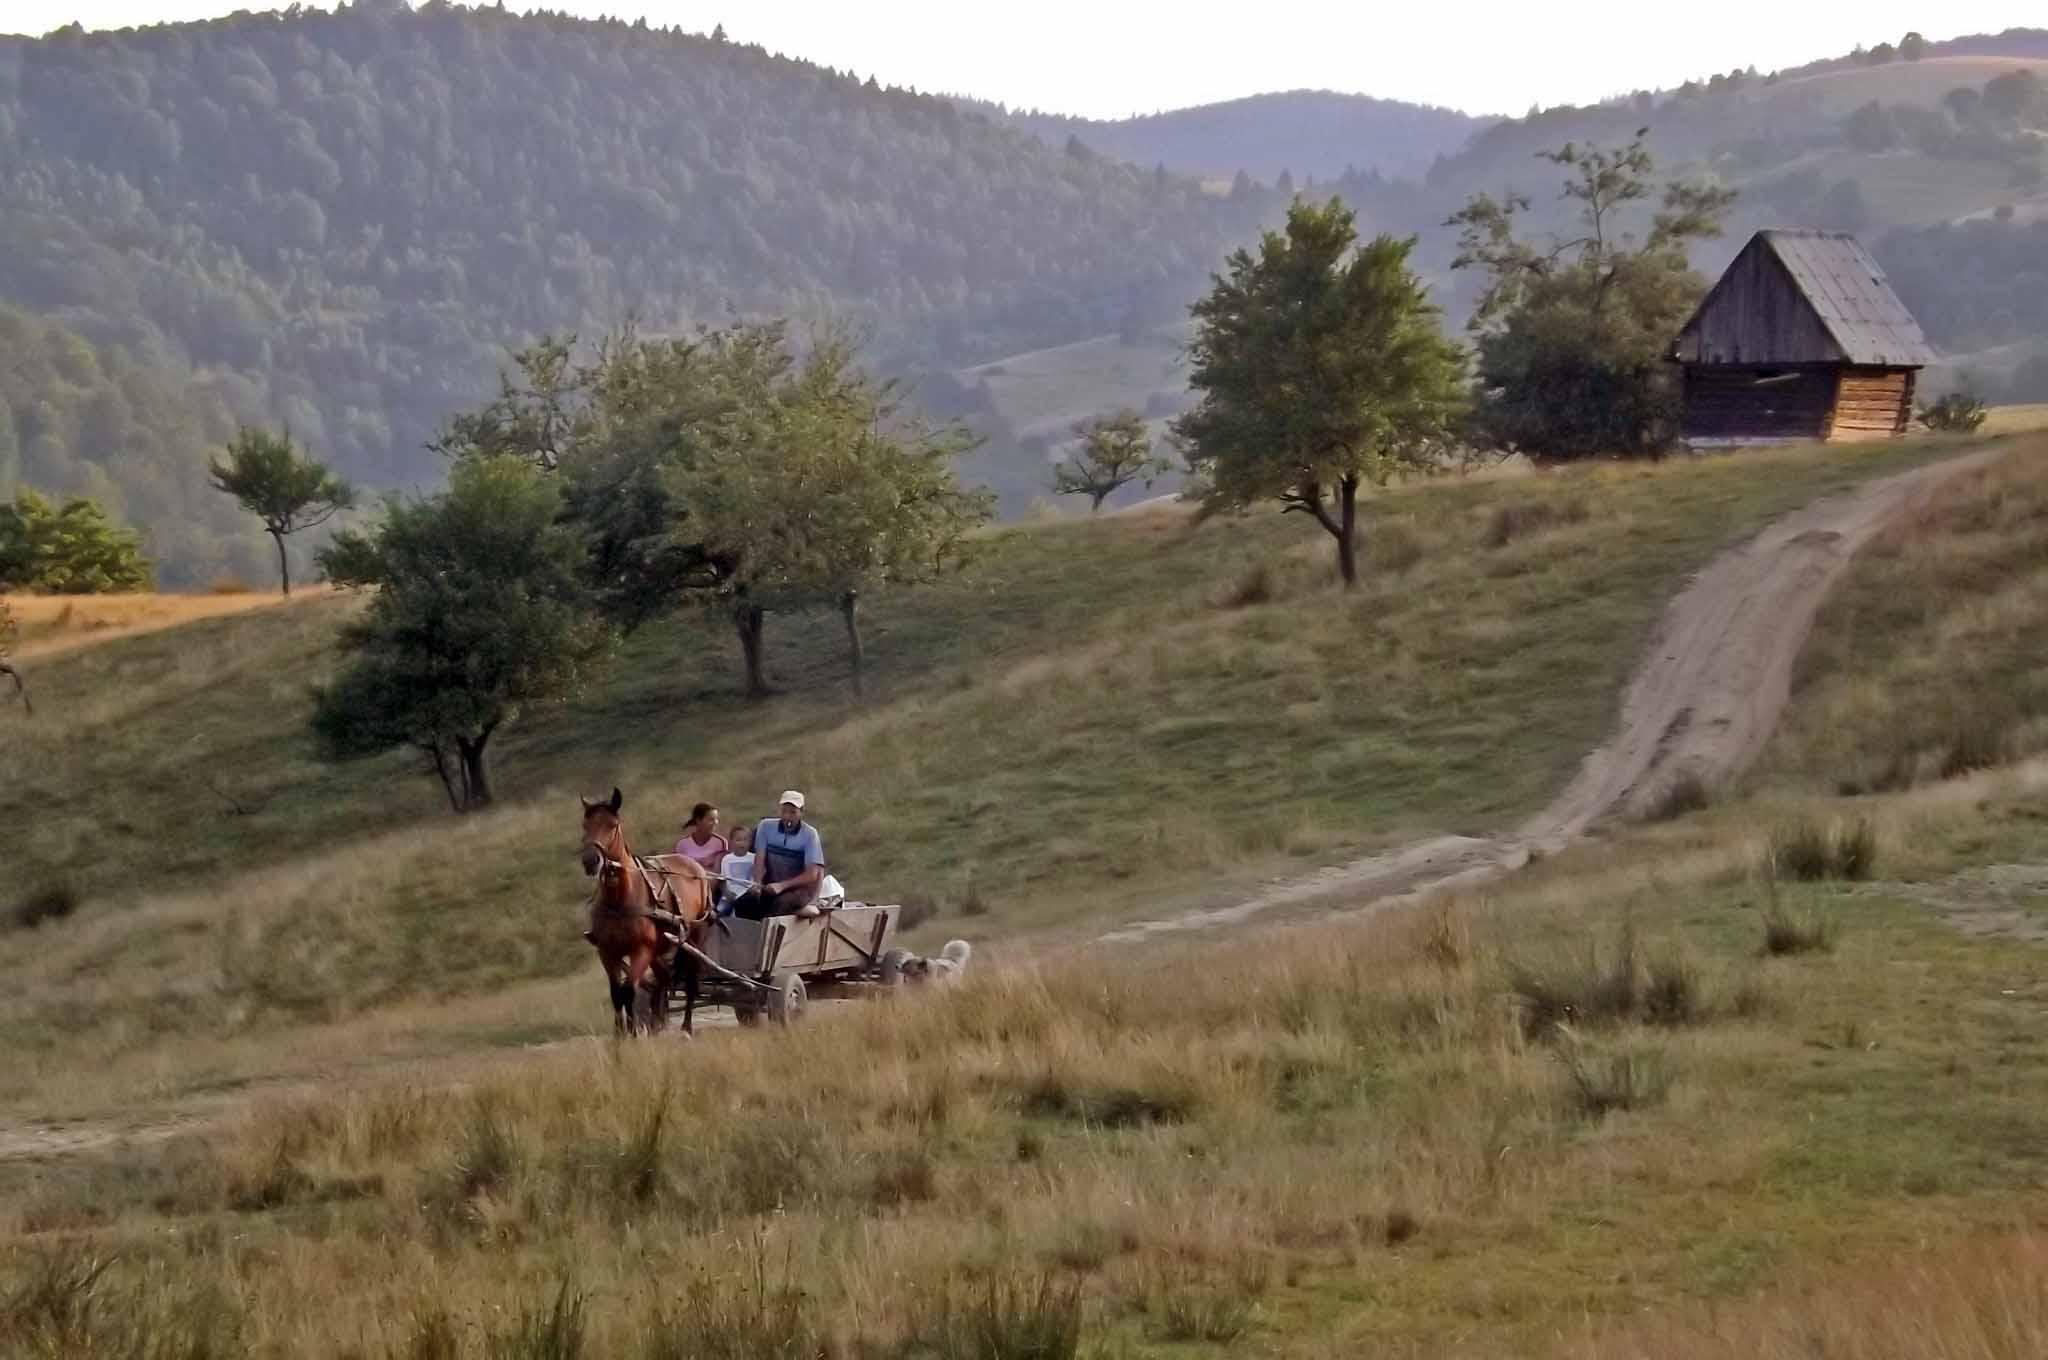 carpathian shepherds hut retreat, romania lodge holidays transylvania